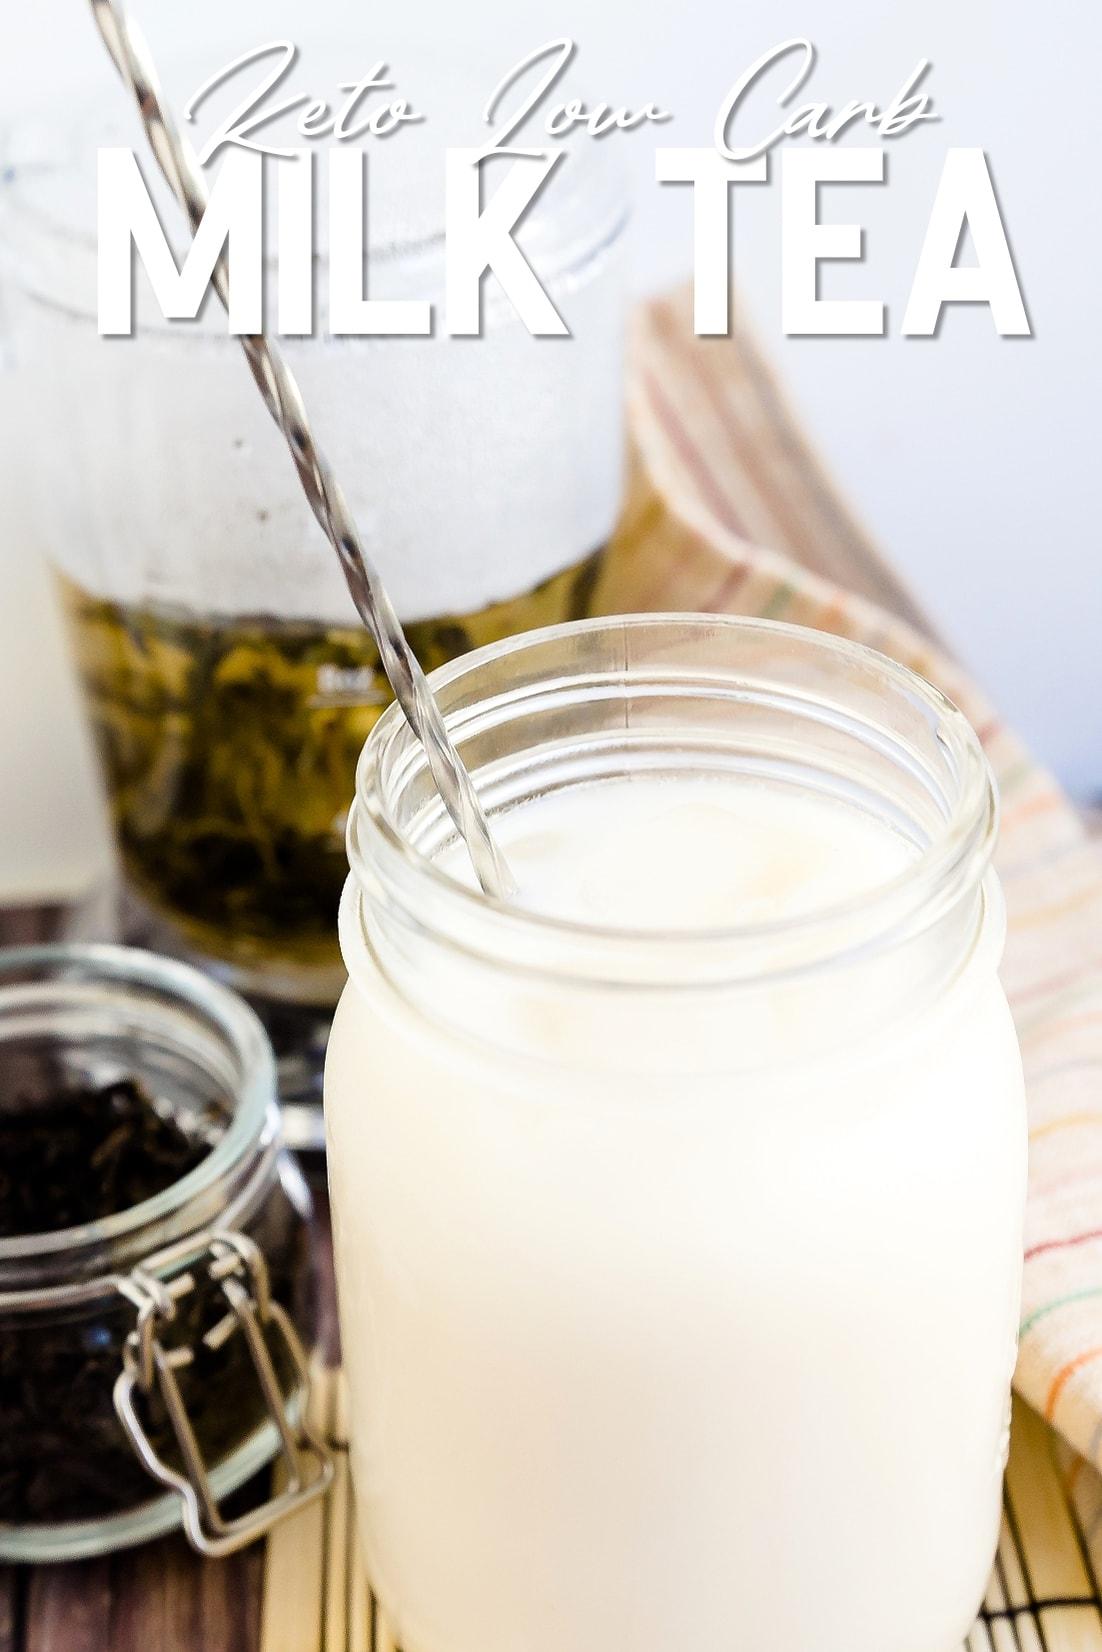 Keto Low Cab Milk Tea Stirring